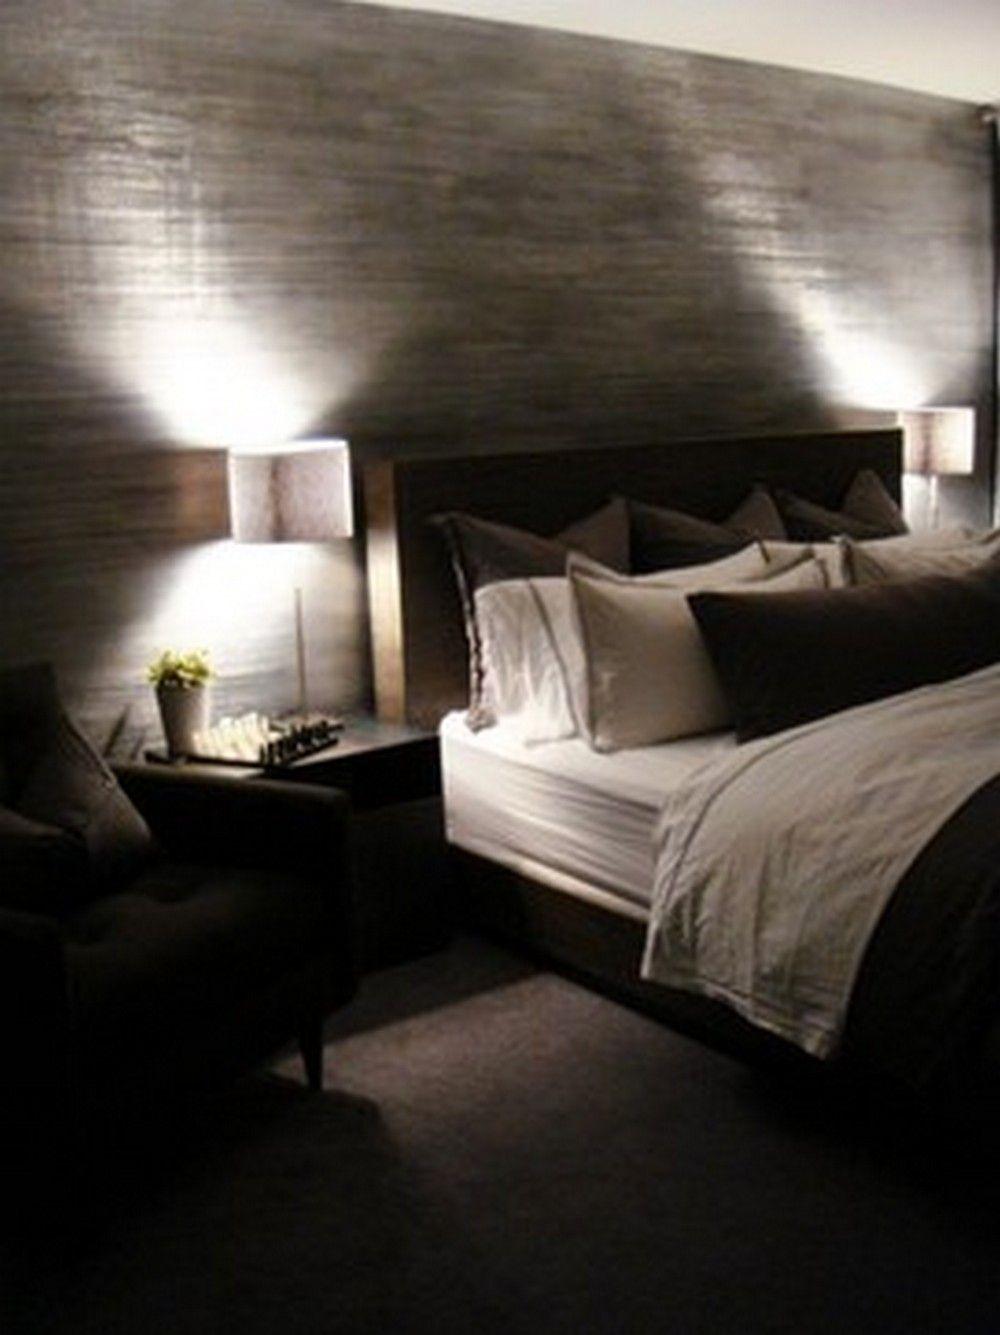 Master bedroom images   Contemporary Master Bedroom Home Decor Ideas  Master bedroom